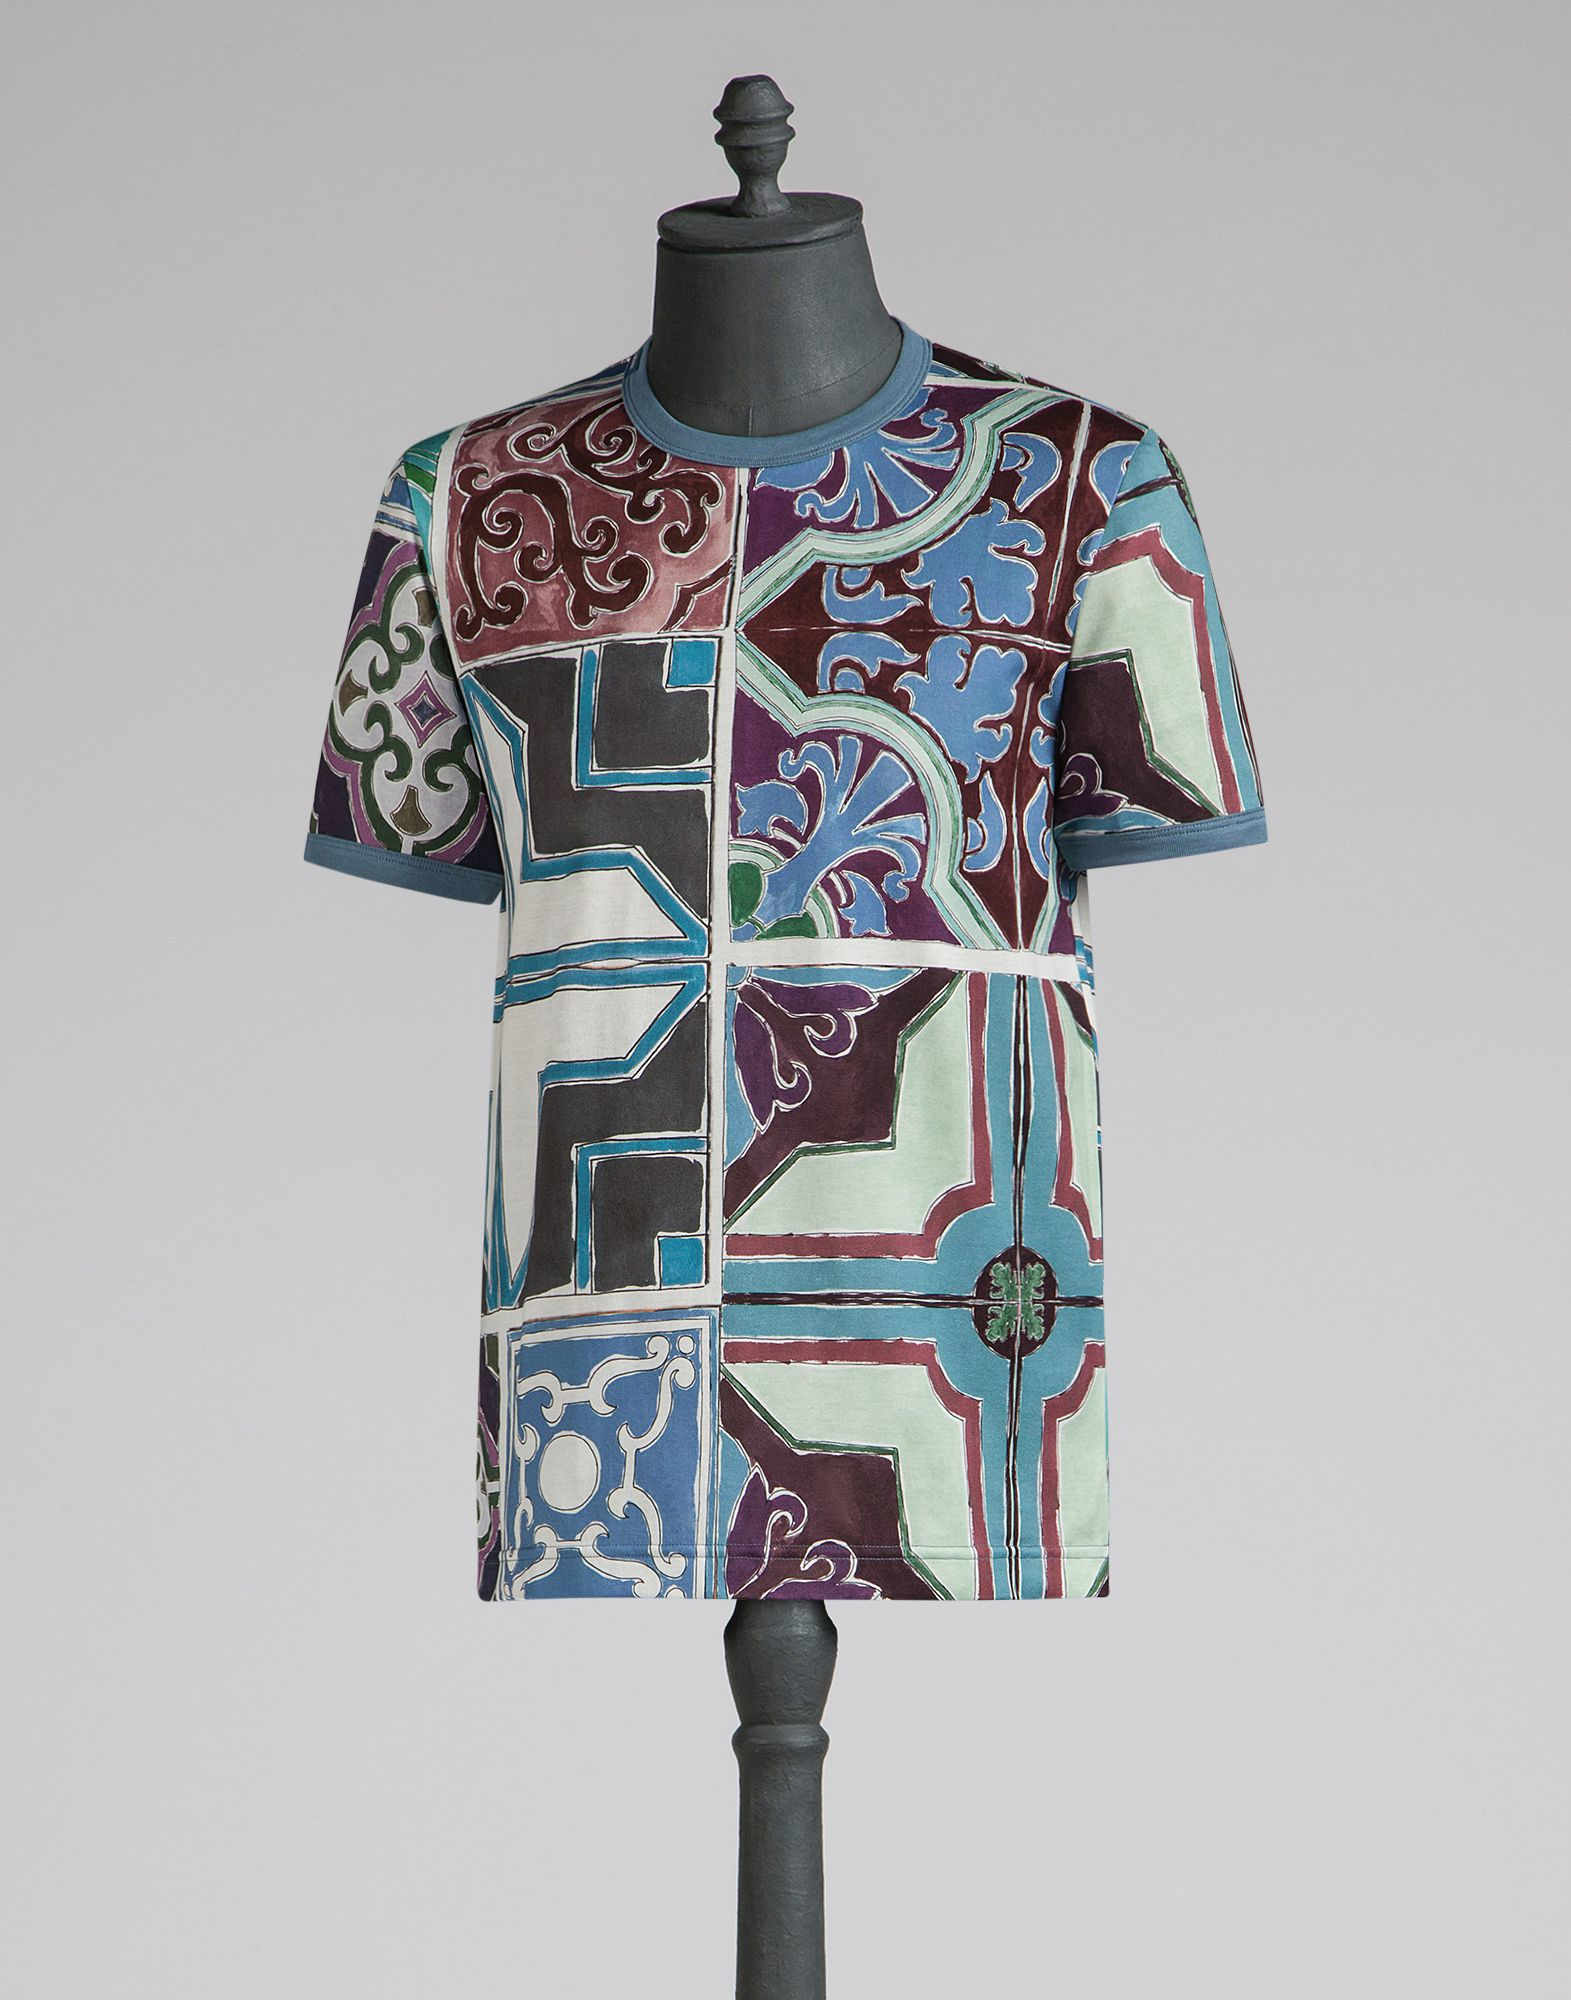 lyst dolce gabbana t shirt with majolica print in blue for men. Black Bedroom Furniture Sets. Home Design Ideas